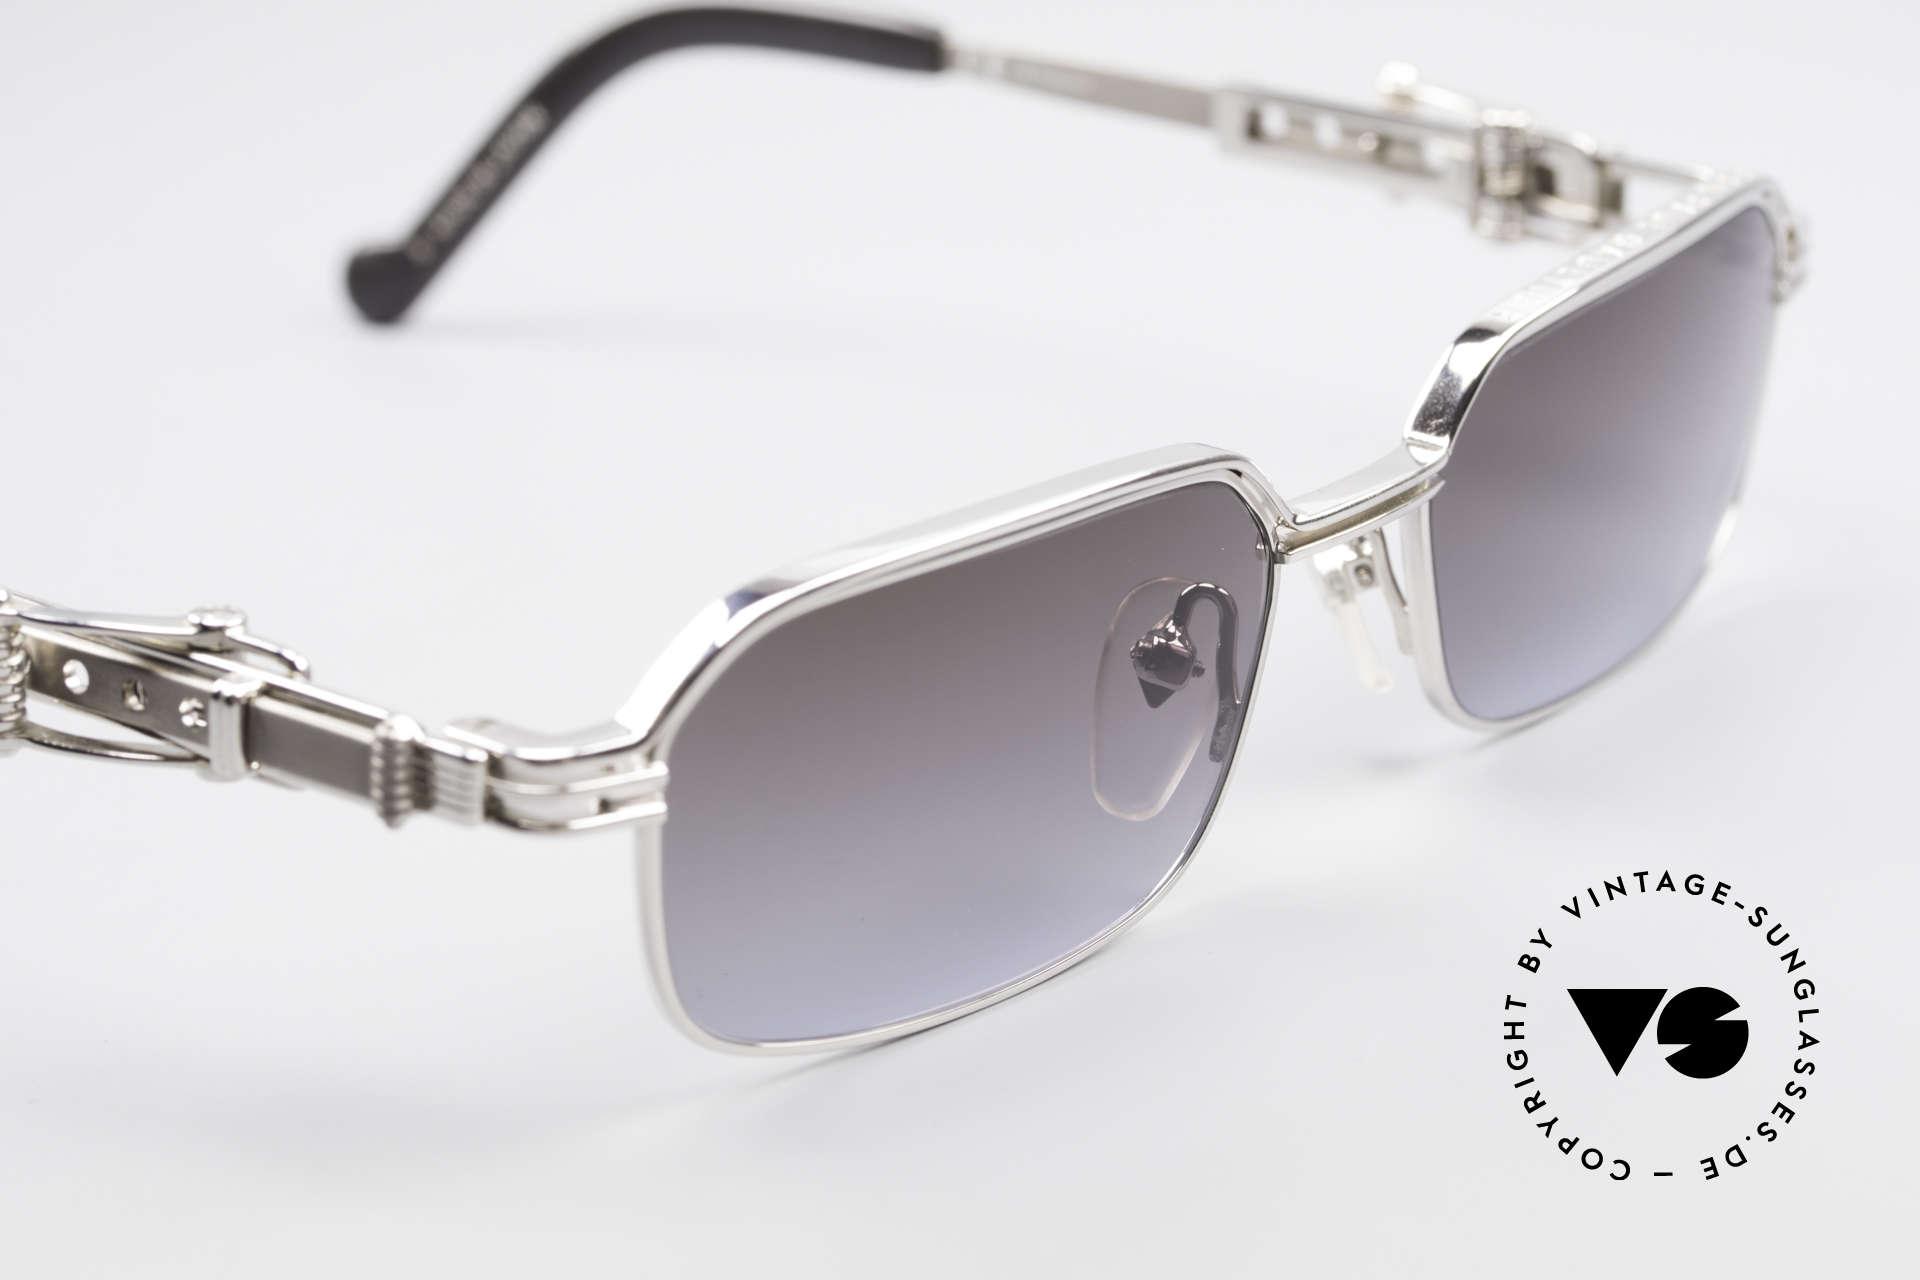 Jean Paul Gaultier 56-0002 Belt Buckle Frame Adjustable, metal frame can be glazed with optical lenses, too, Made for Men